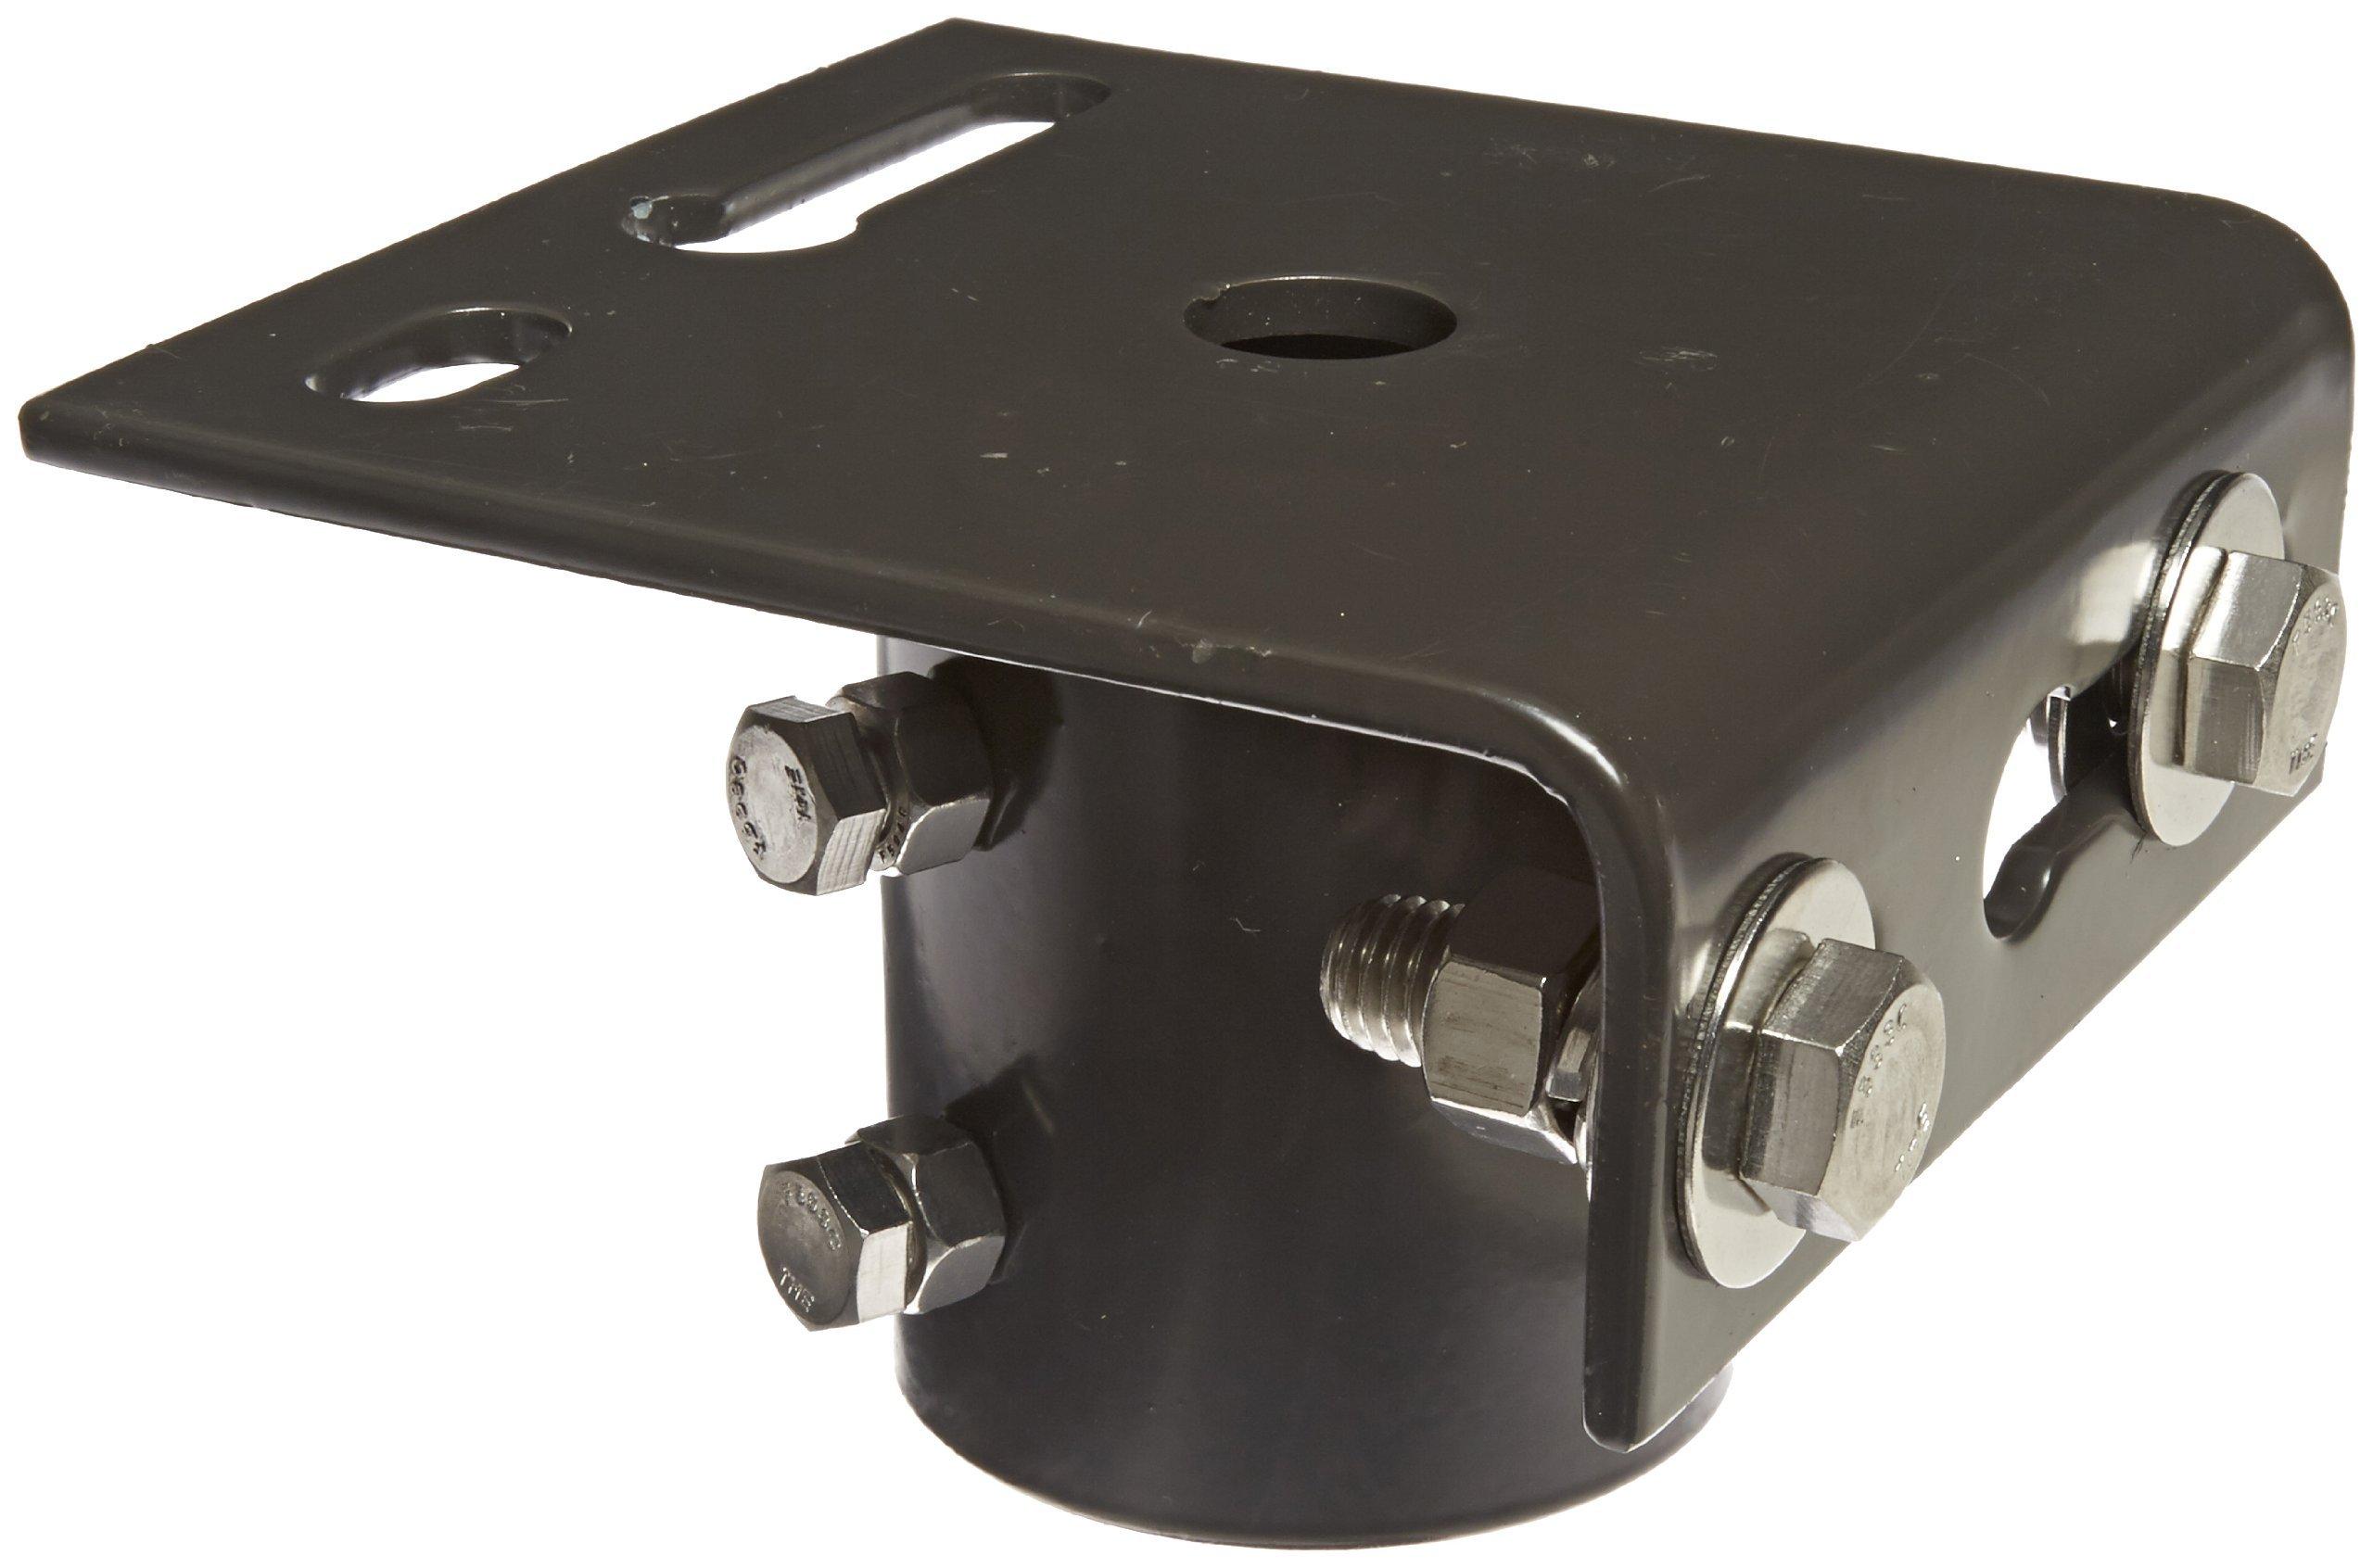 RAB Lighting BSF Universal Mounting Bracket, 0.2 EPA Maximum Capacity, 5-5/8'' Length x 5-1/2'' Width x 3-3/4'' Height